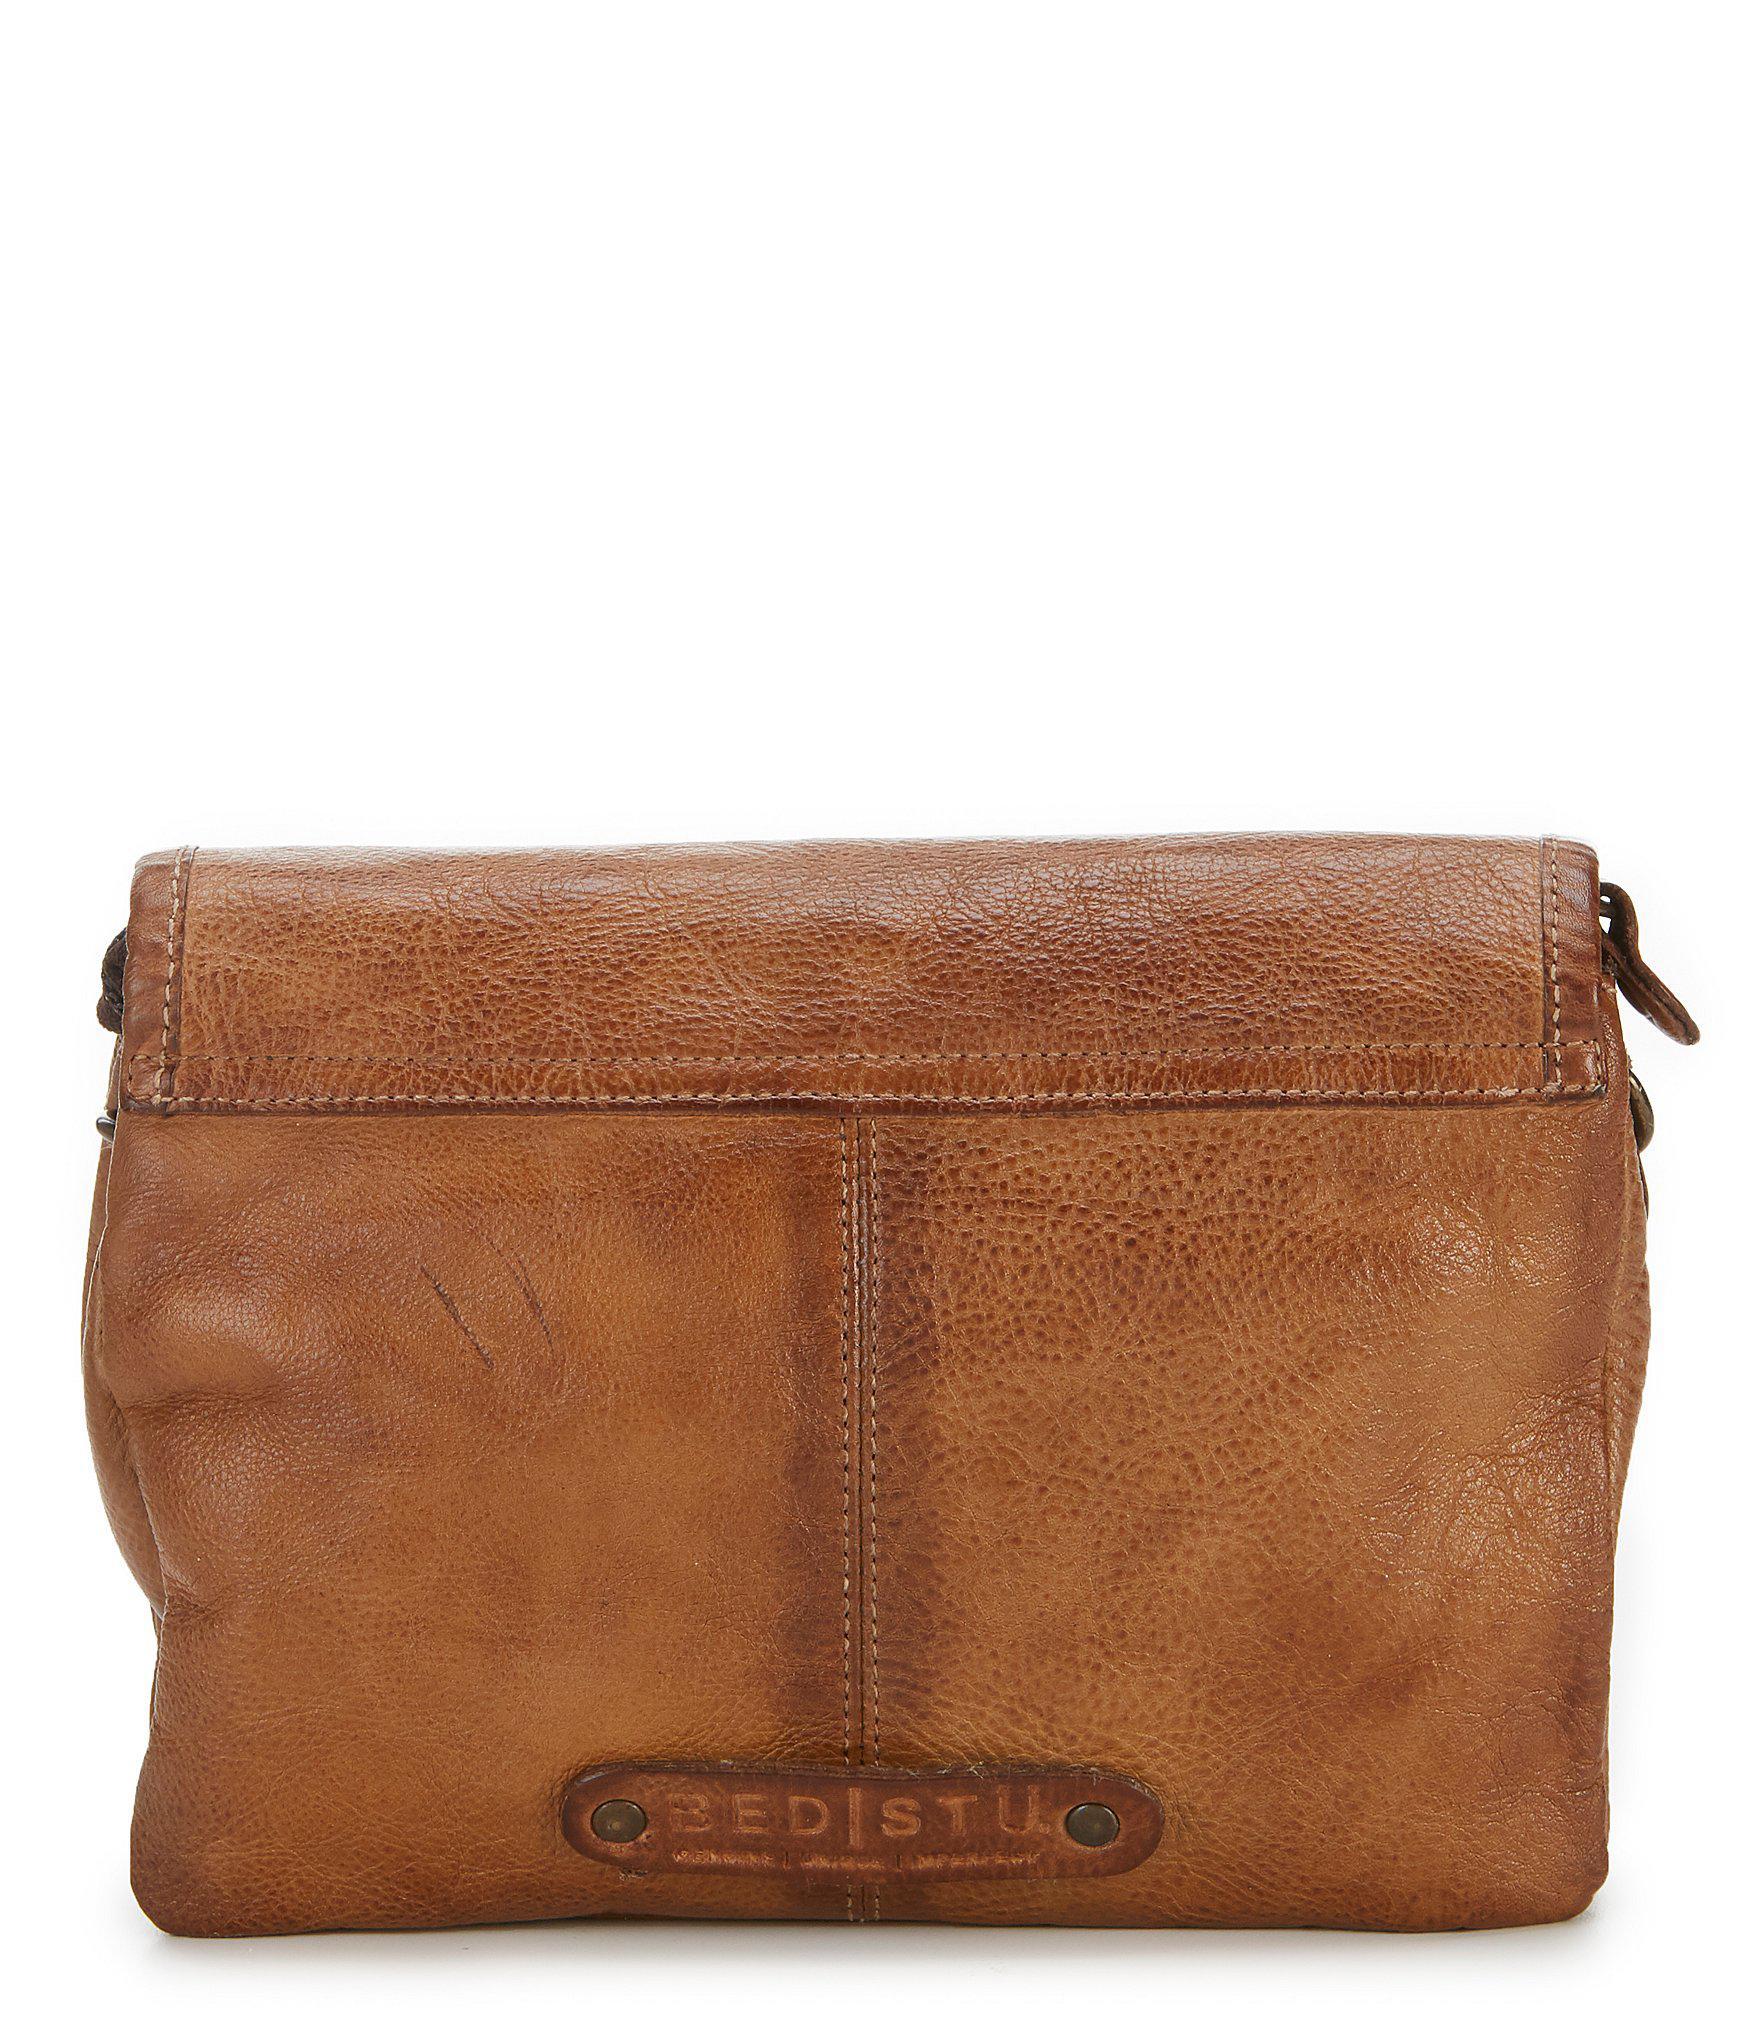 Lyst - Bed Stu Ziggy Cross-body Bag in Brown 516cde5b32b63